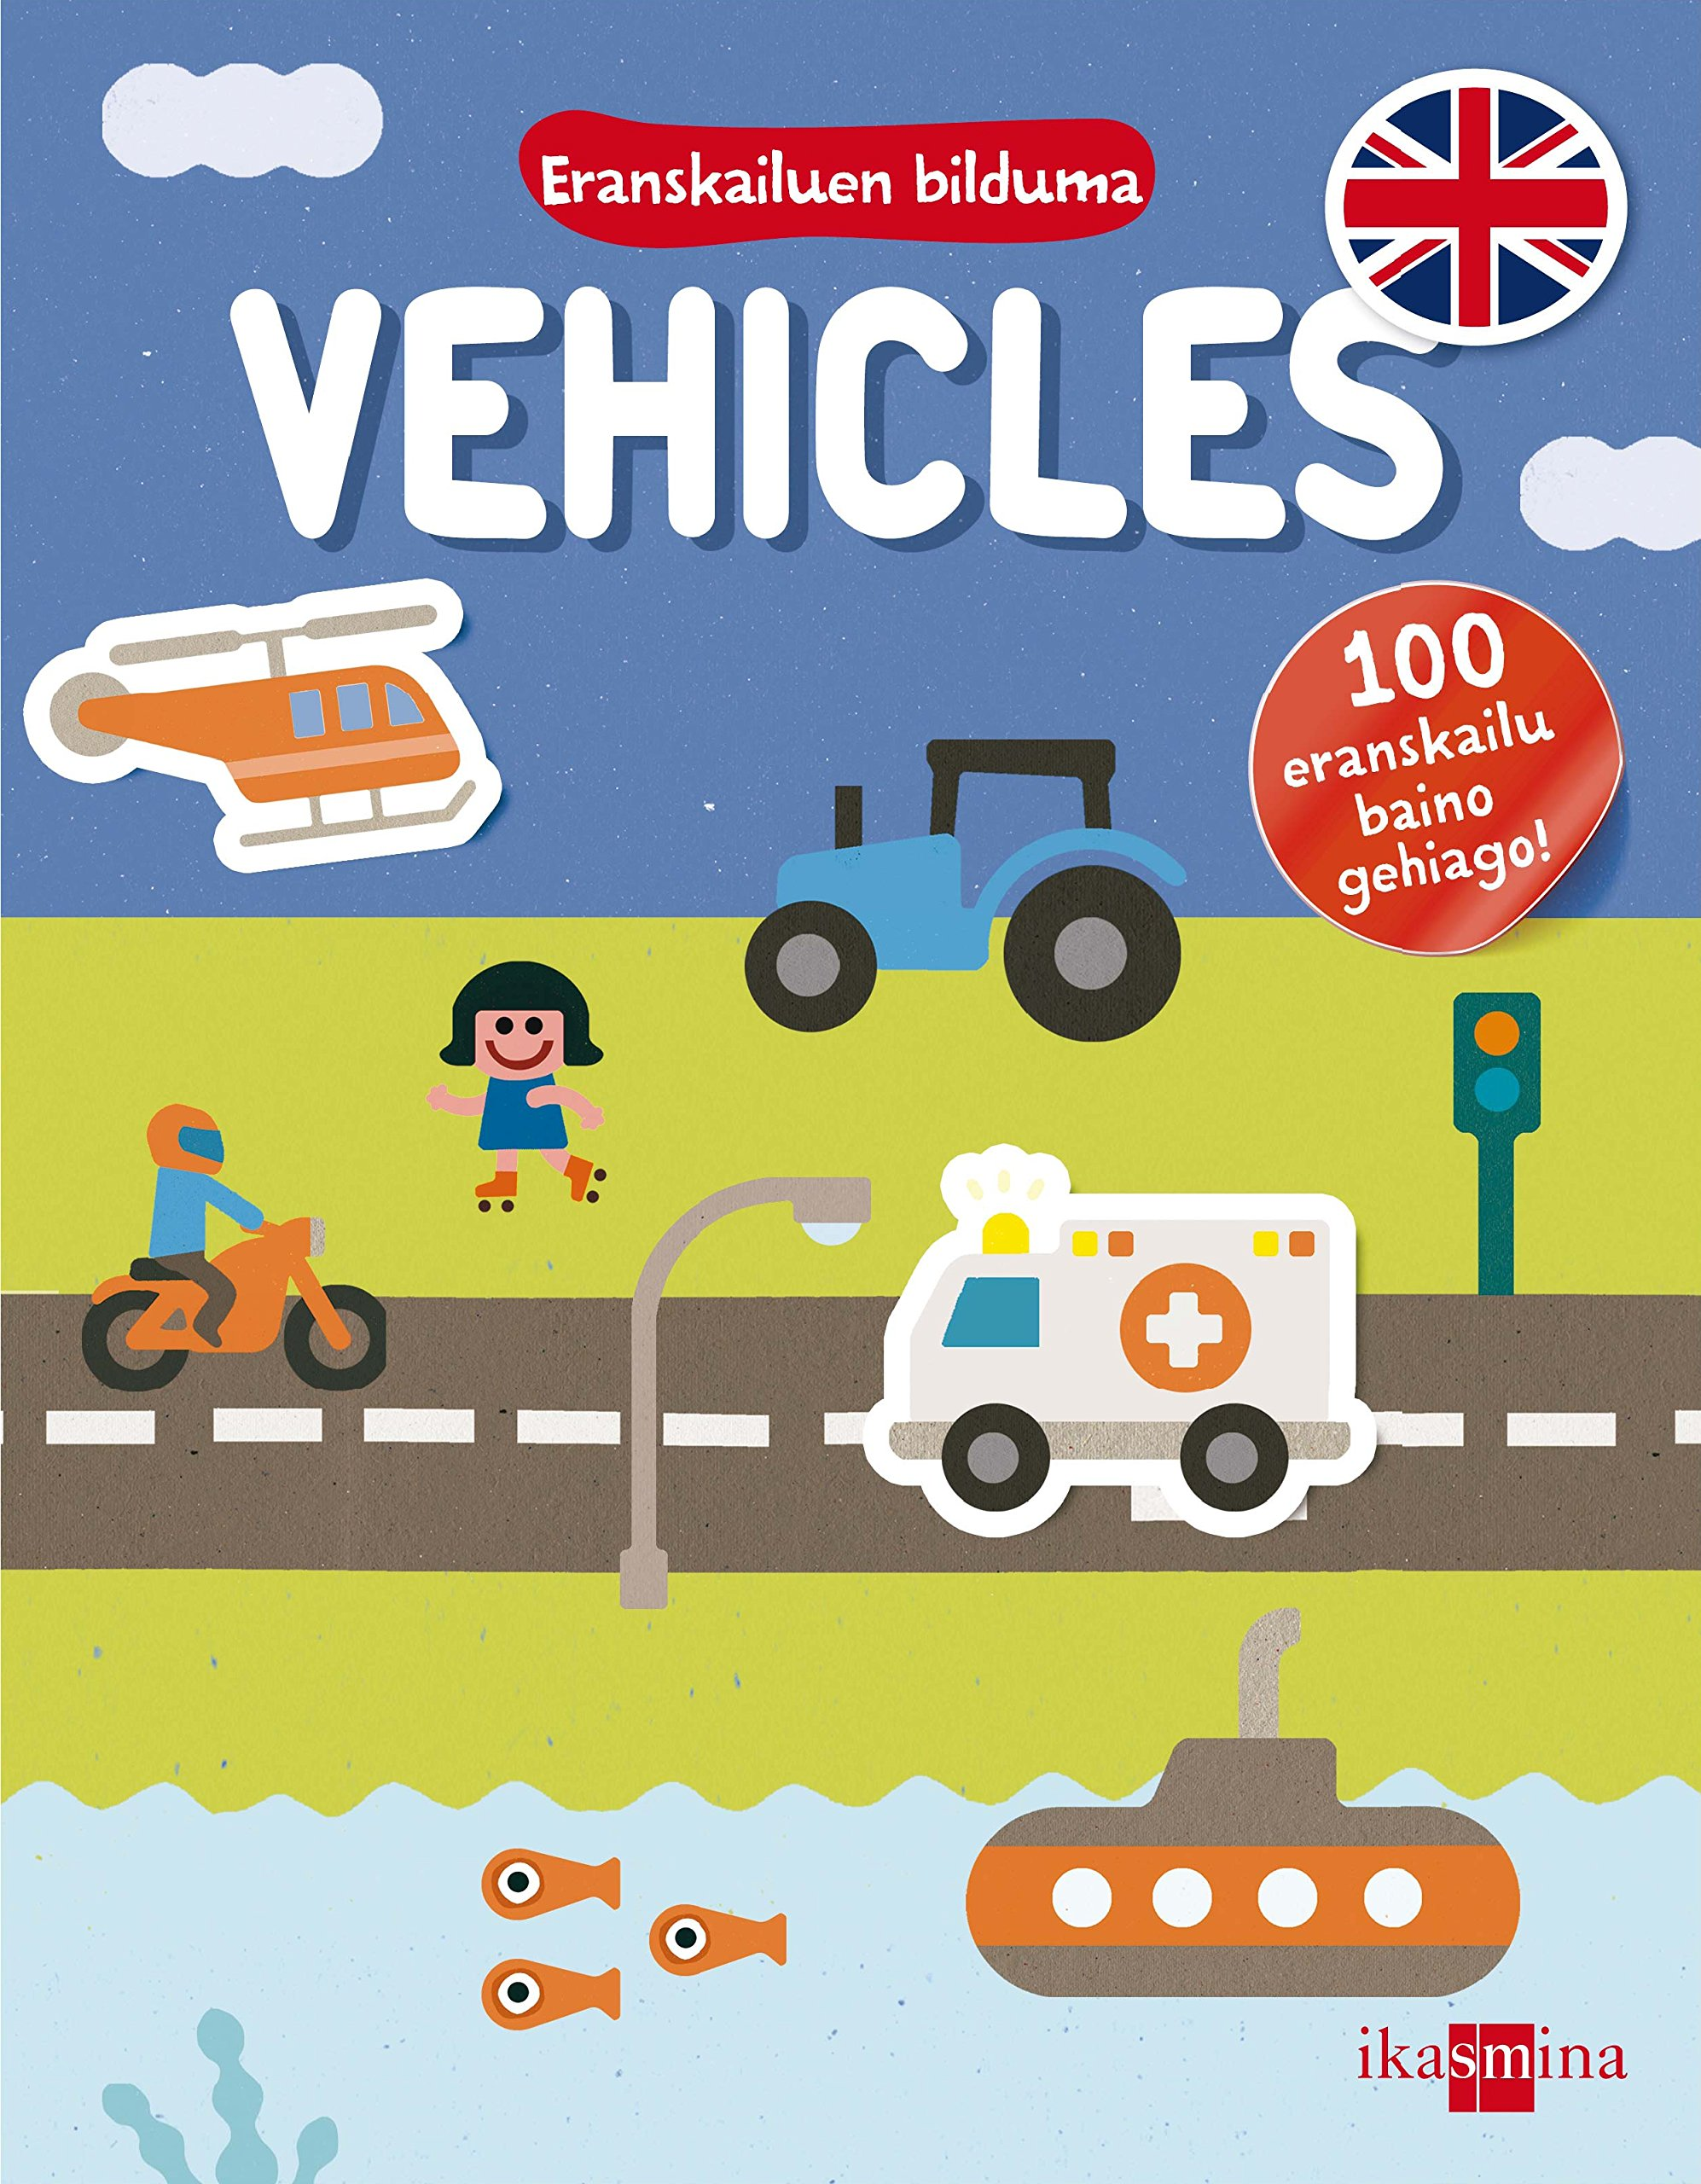 Vehicles (Pegatinas) (Euskera) Tapa blanda – 12 may 2016 Ediciones SM Miguel Ordóñez Bakun S.L. IKASMINA ARGITALETXEA